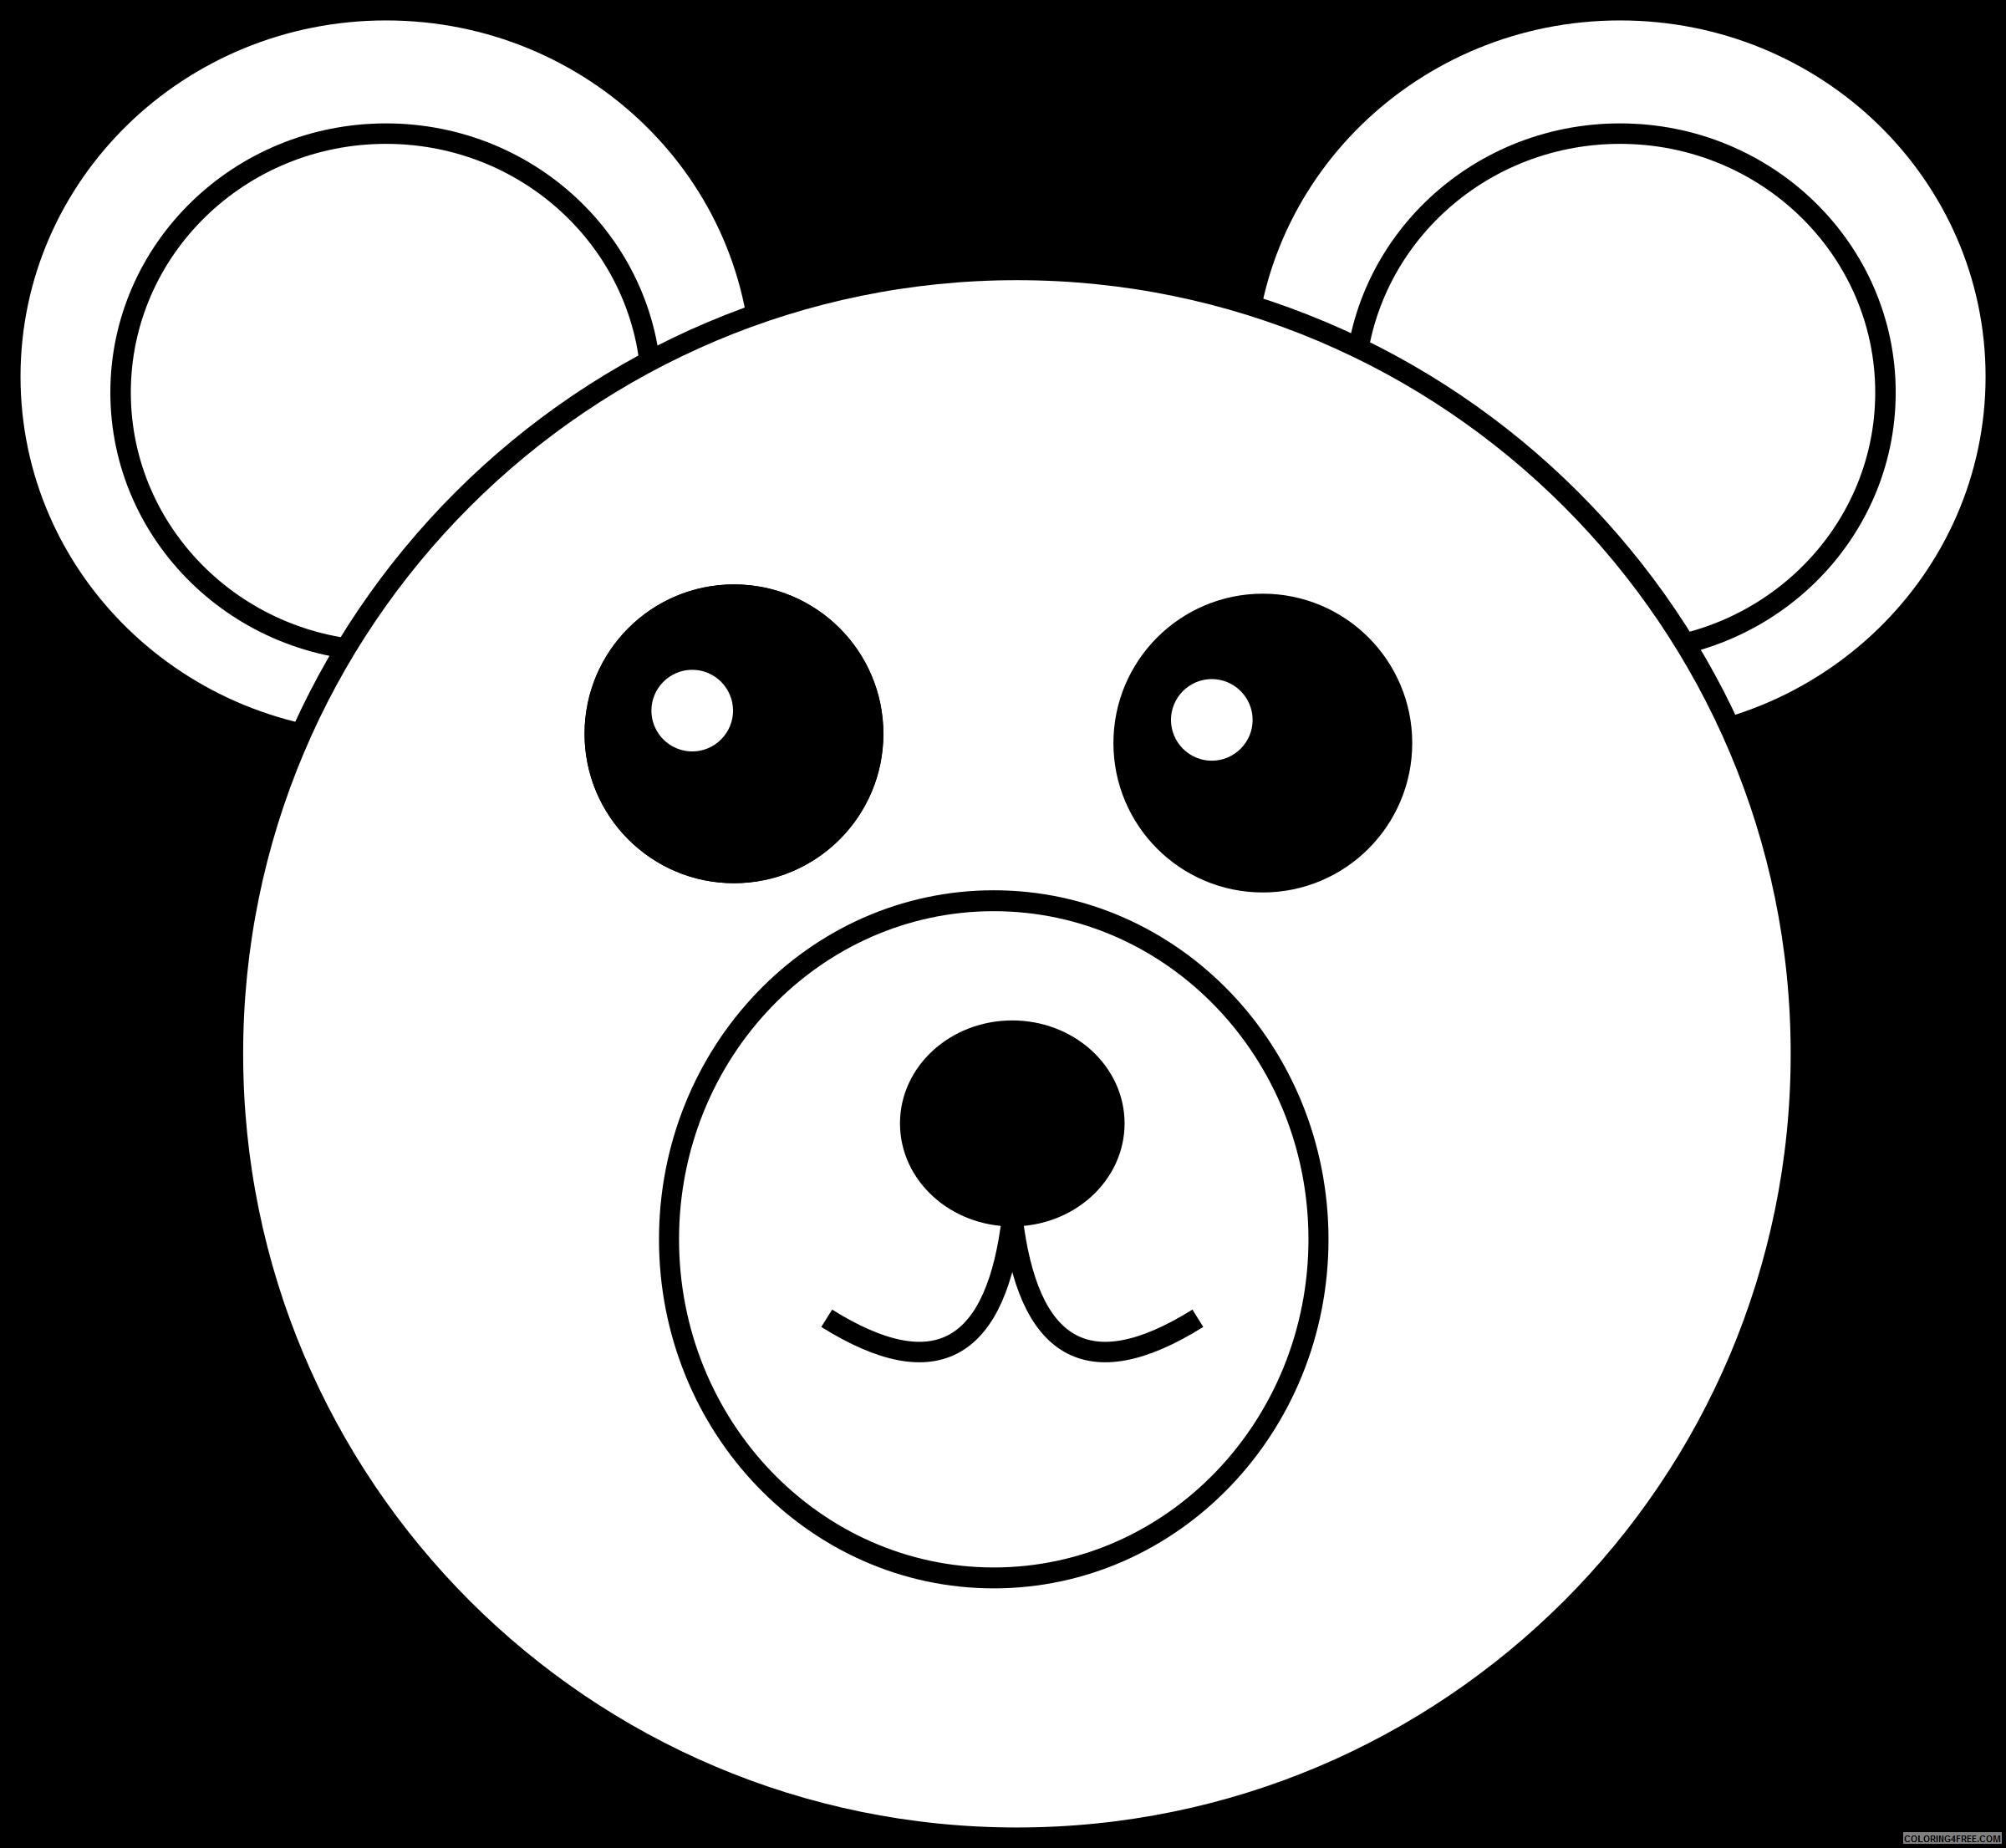 little bear by spevi 5WiMOr coloring